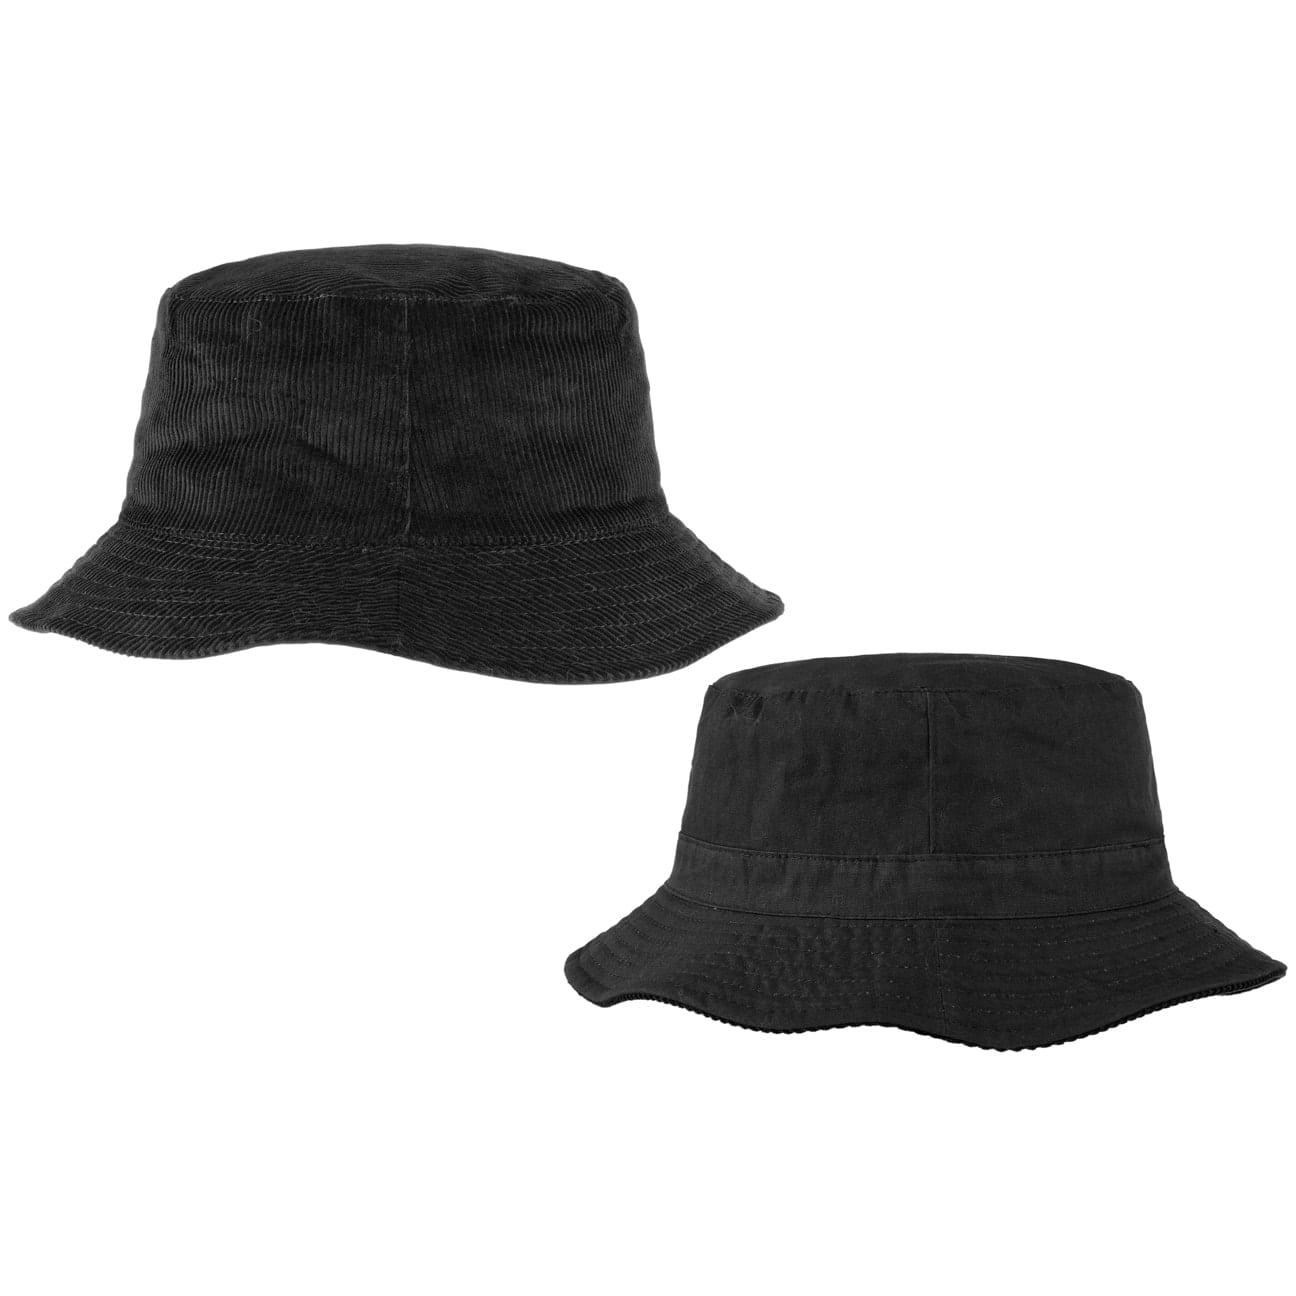 Chapeau Réversible Waxed Cotton by Lipodo  chapeau en tissu